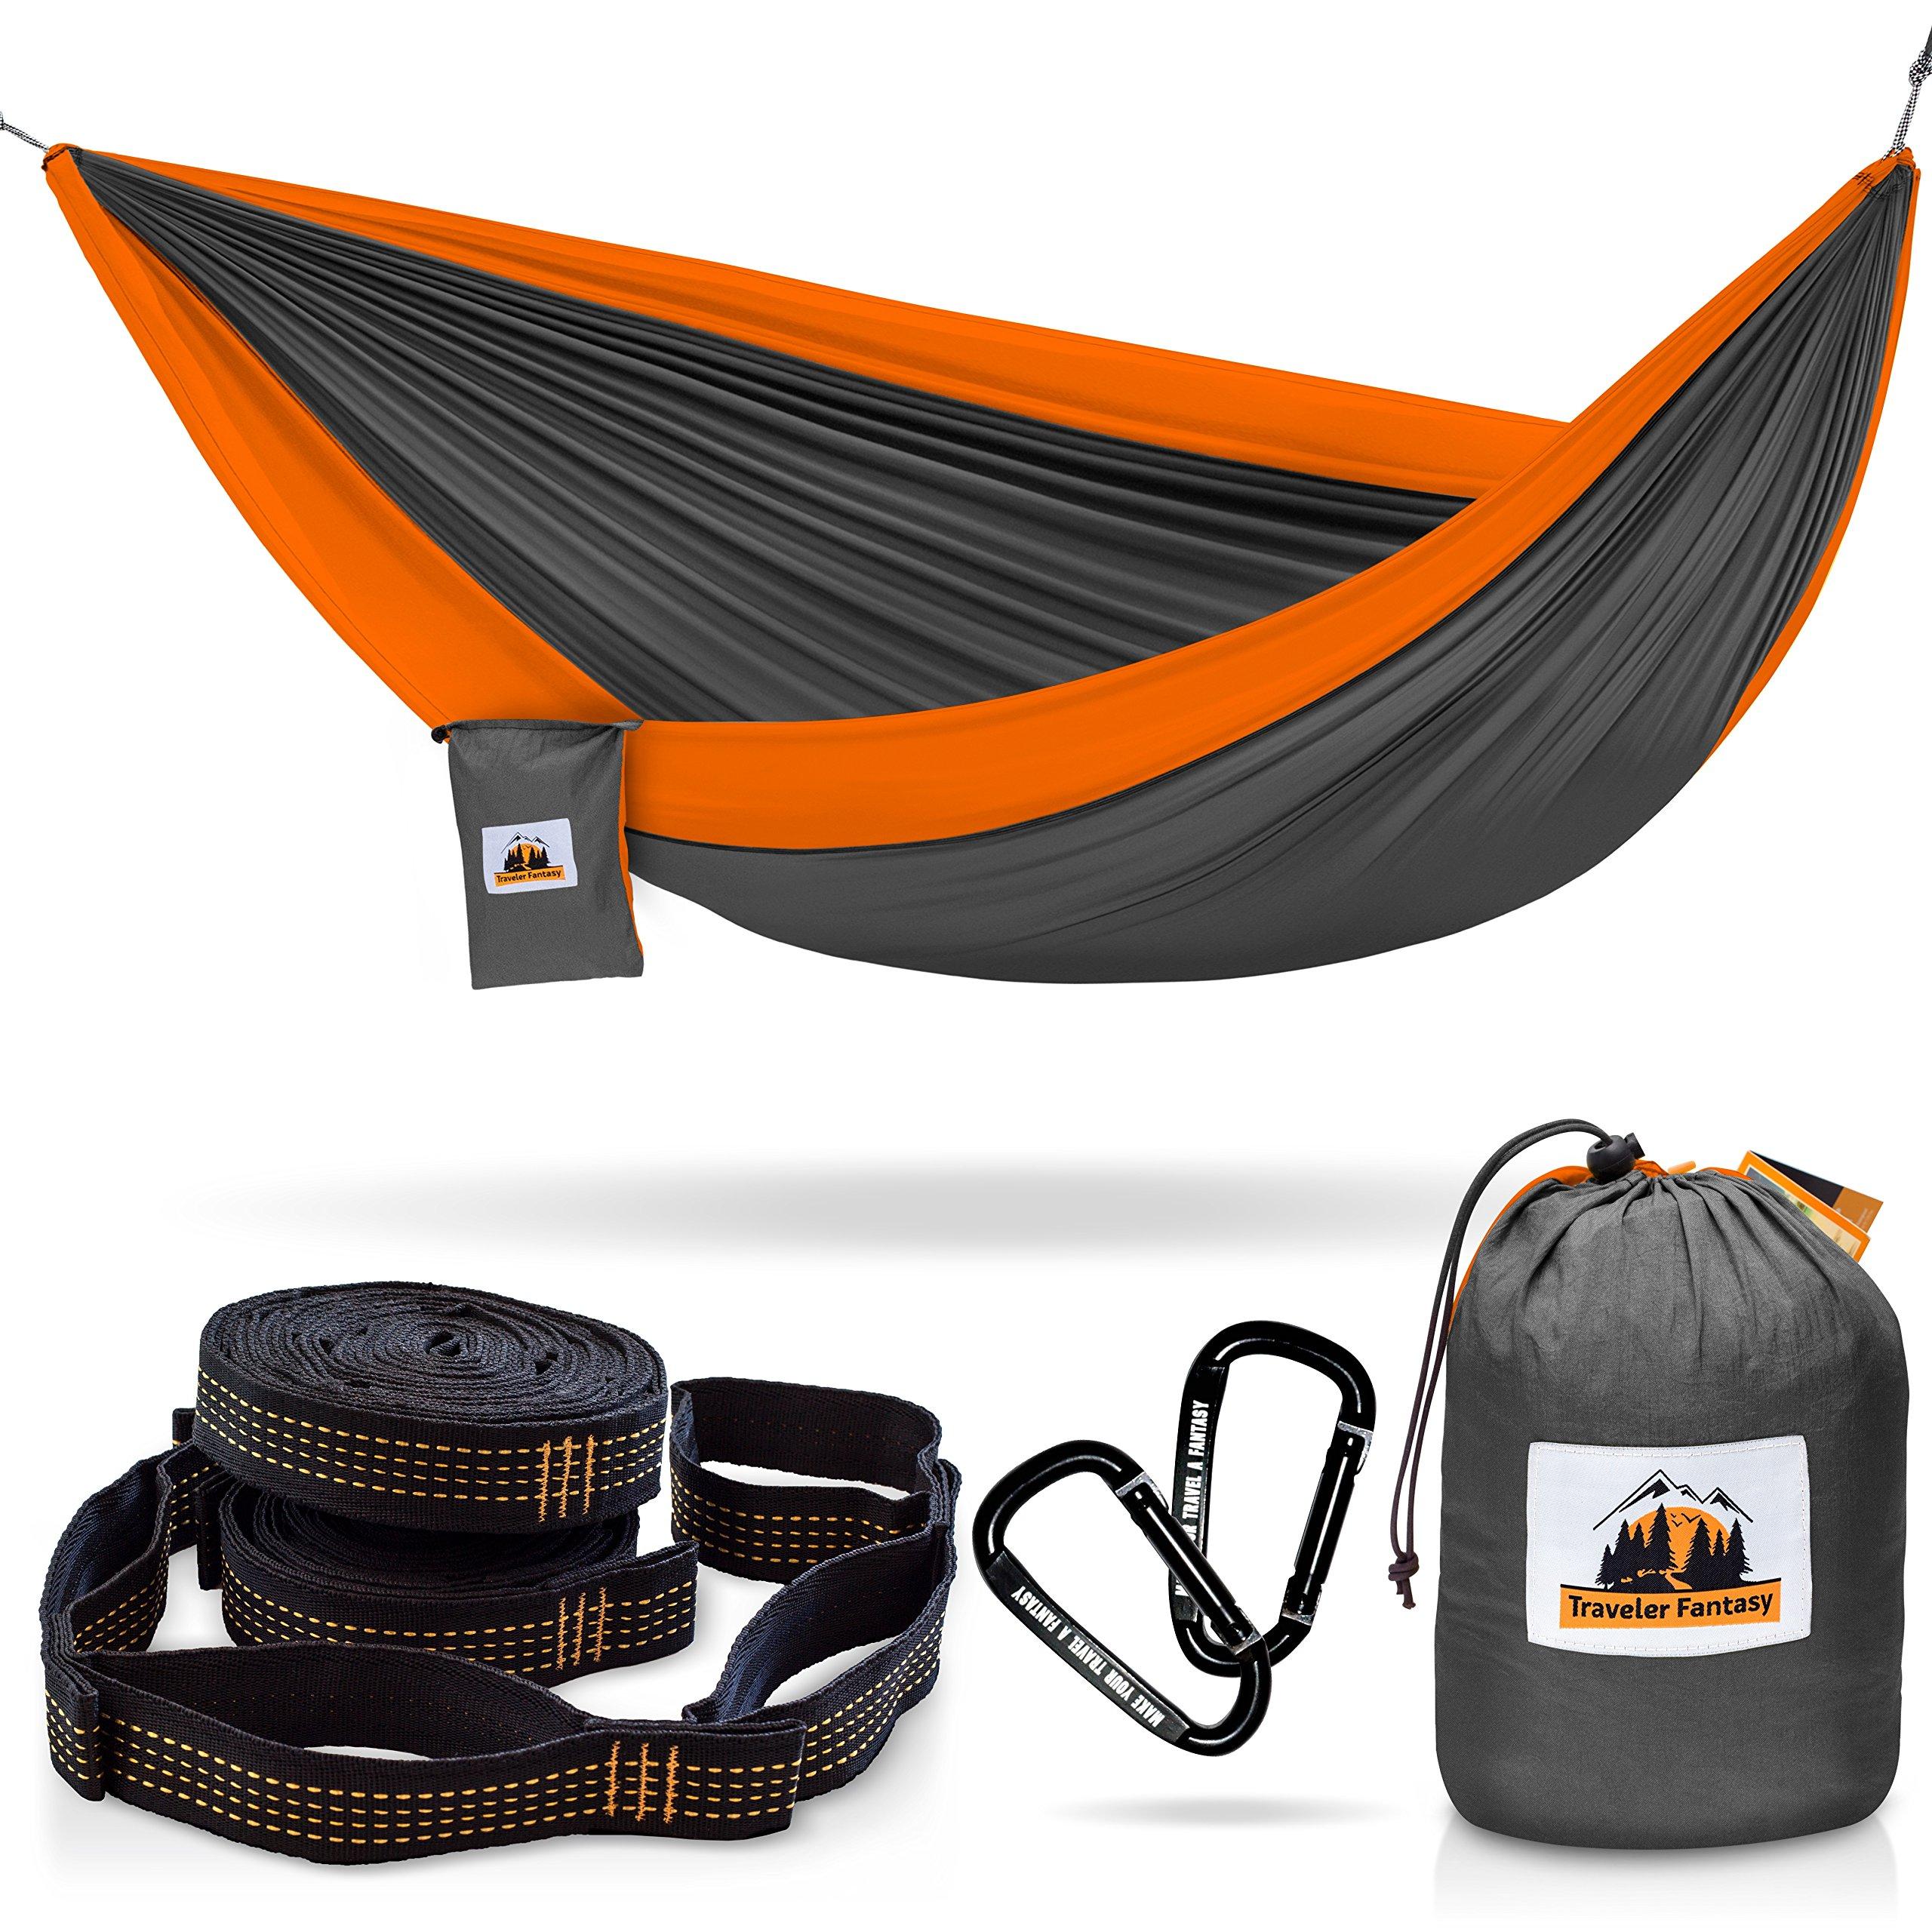 Traveler Fantasy Double Camping Hammock: Durable Nylon Parachute Portable Ultraweight Hammock, Backpacking, Beach, Yard, Swing, Super Strong Straps & Carabiner (Smoke Gray with Salamander Orange) by Traveler Fantasy